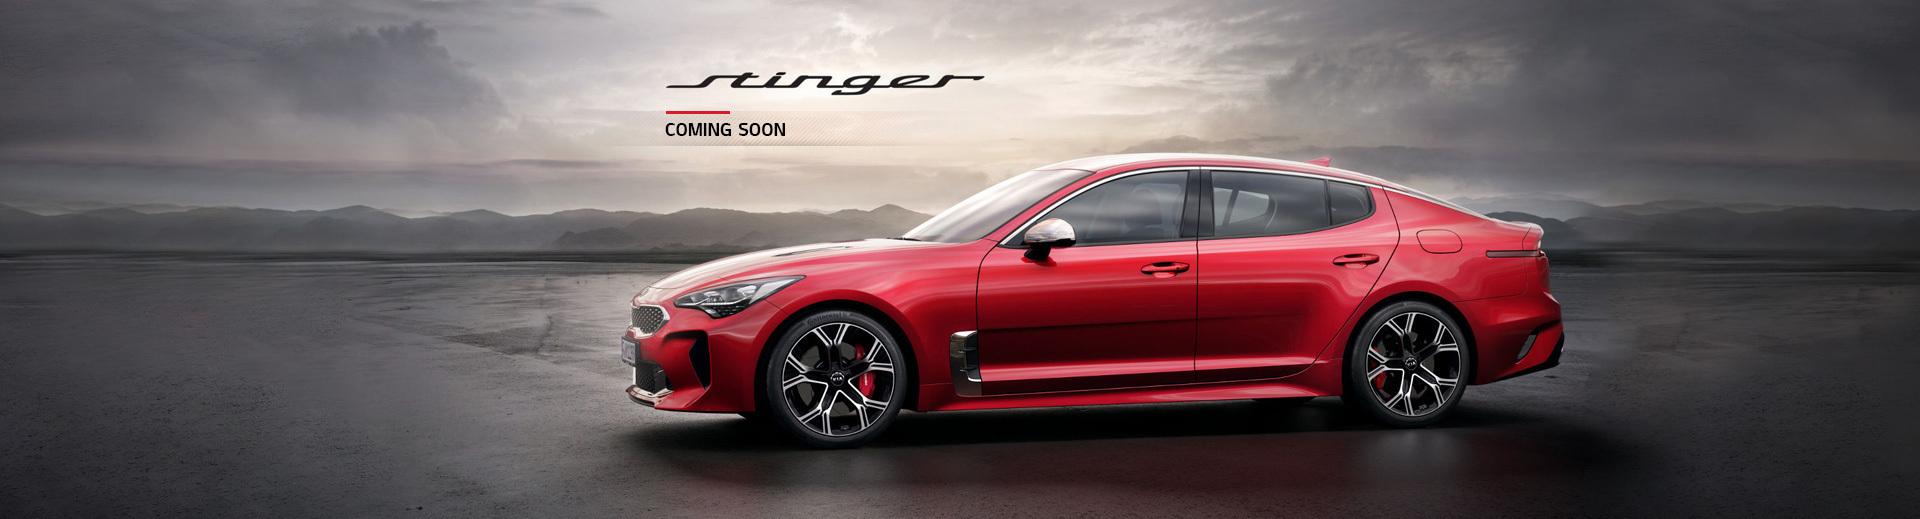 Coming Soon - Kia Stinger